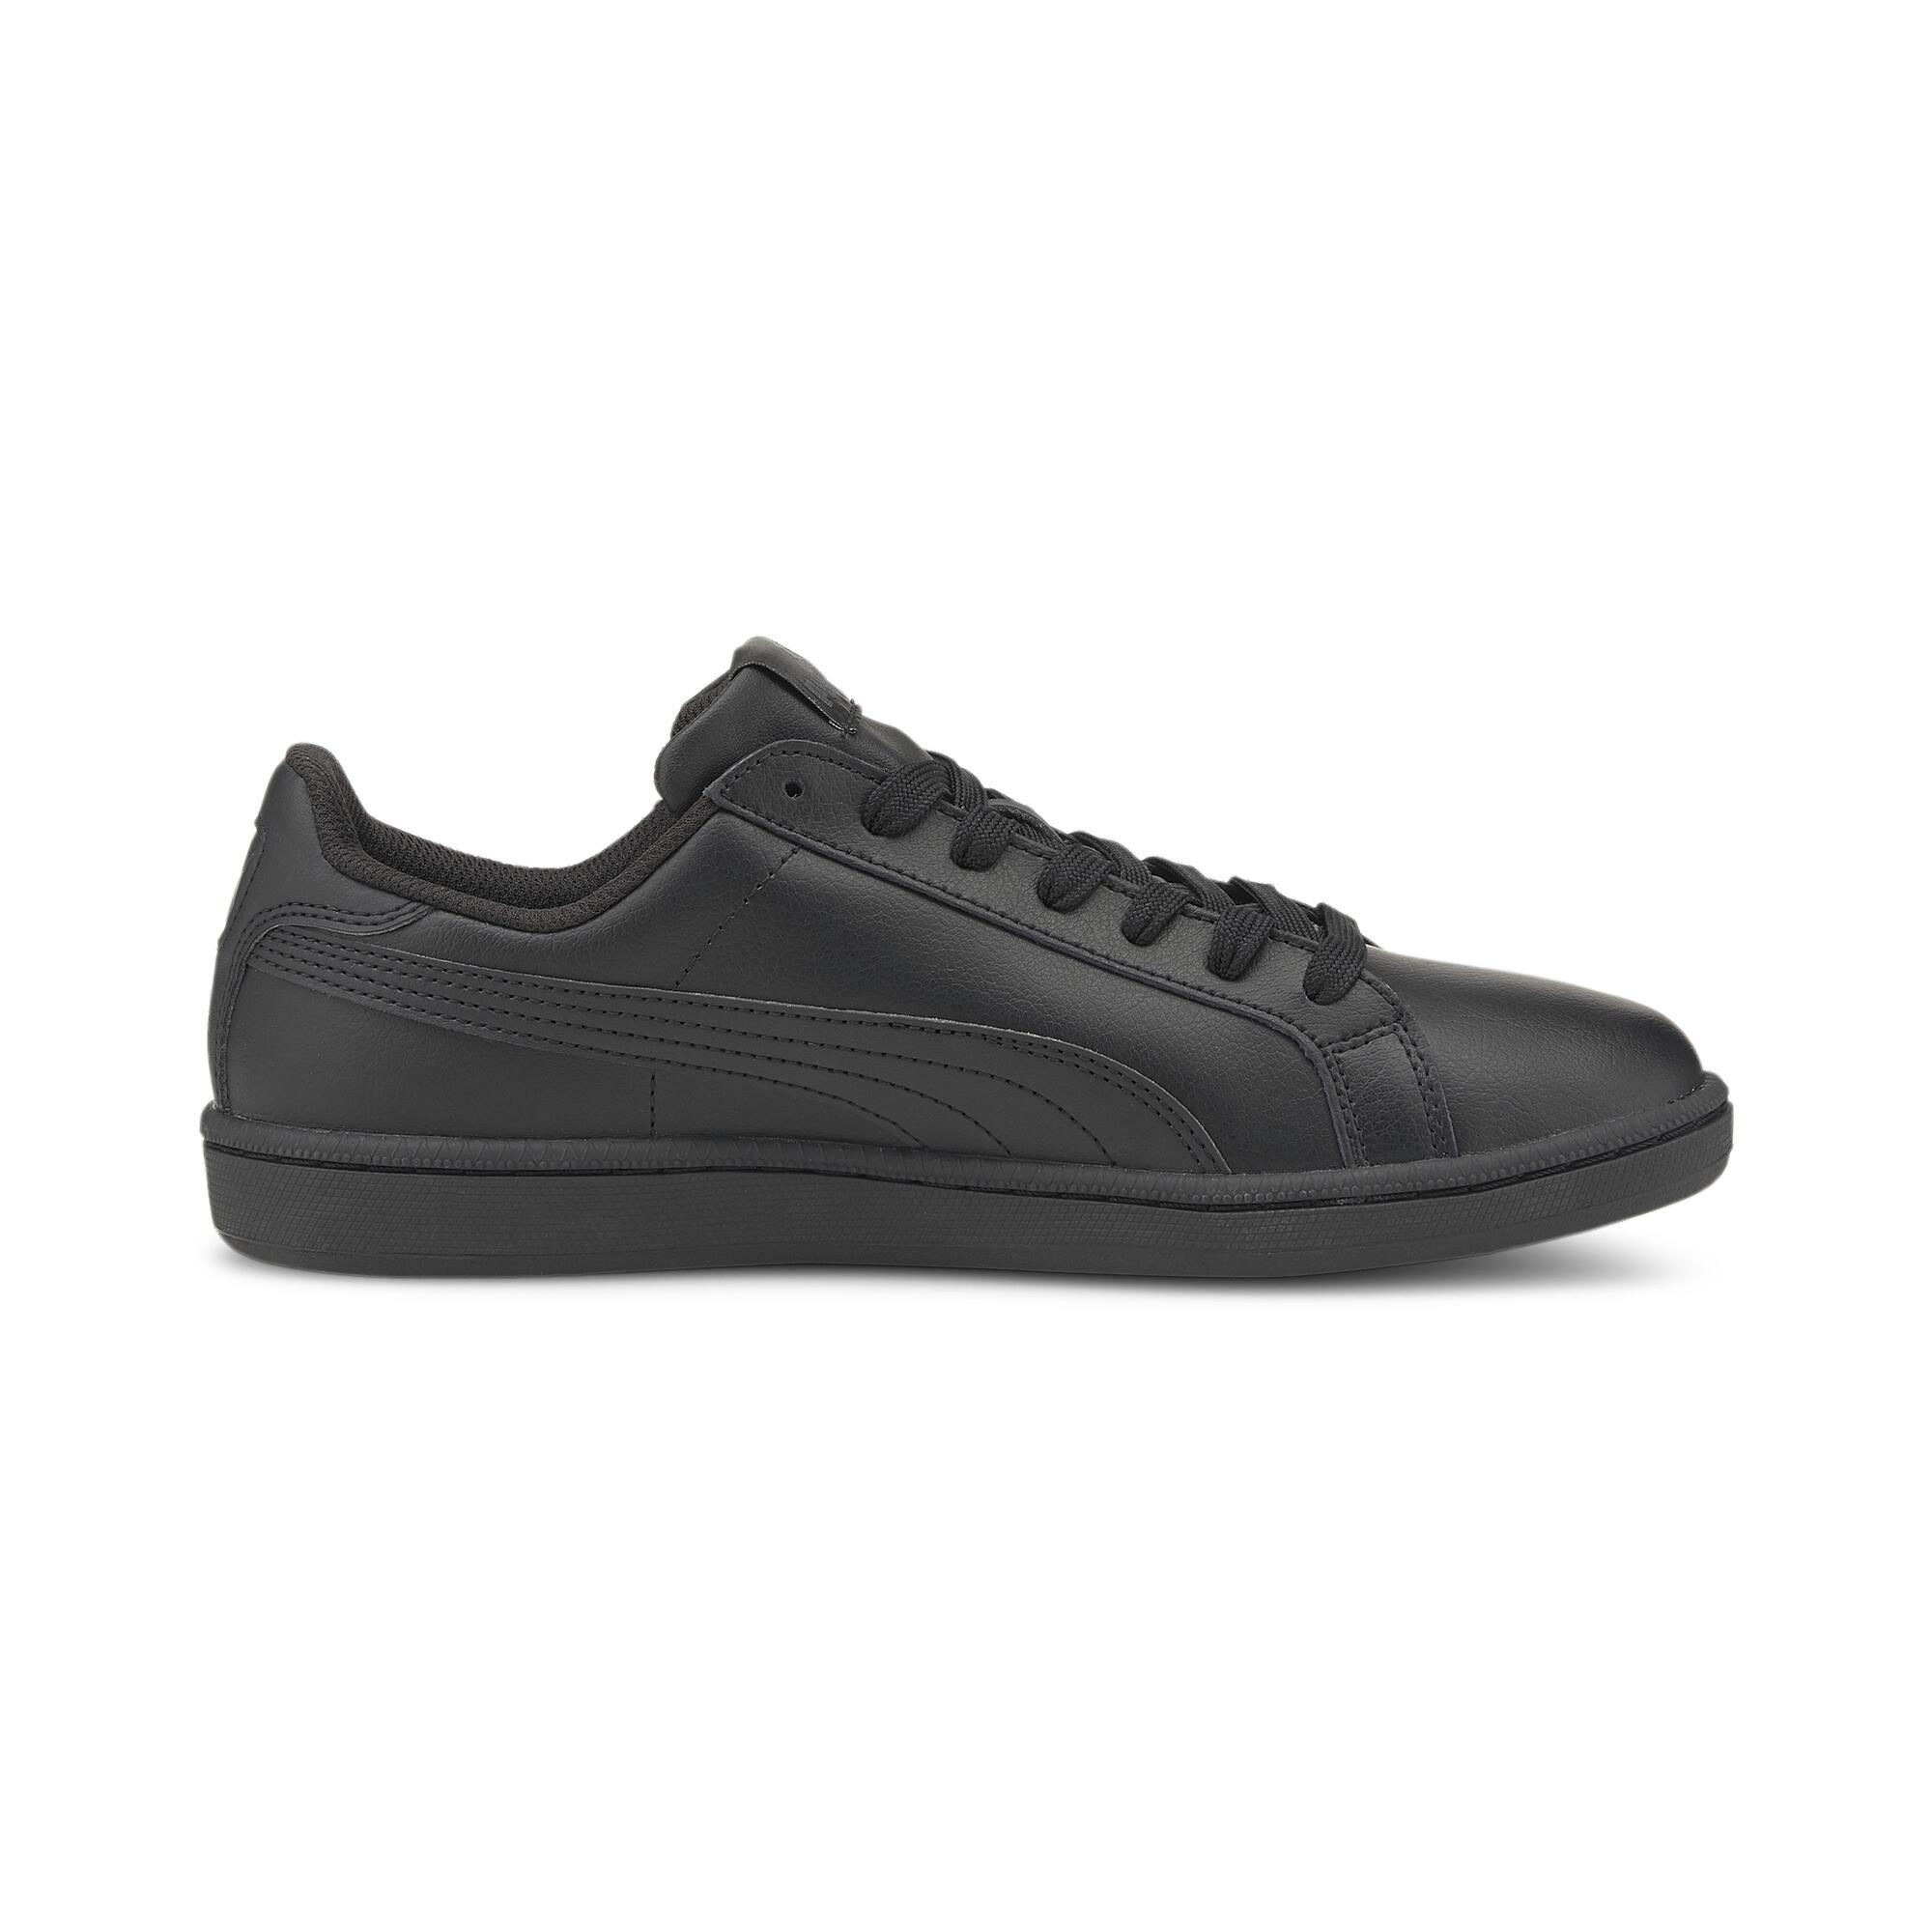 Indexbild 11 - PUMA Smash Trainers Schuhe Sneakers Sport Classics Unisex Neu